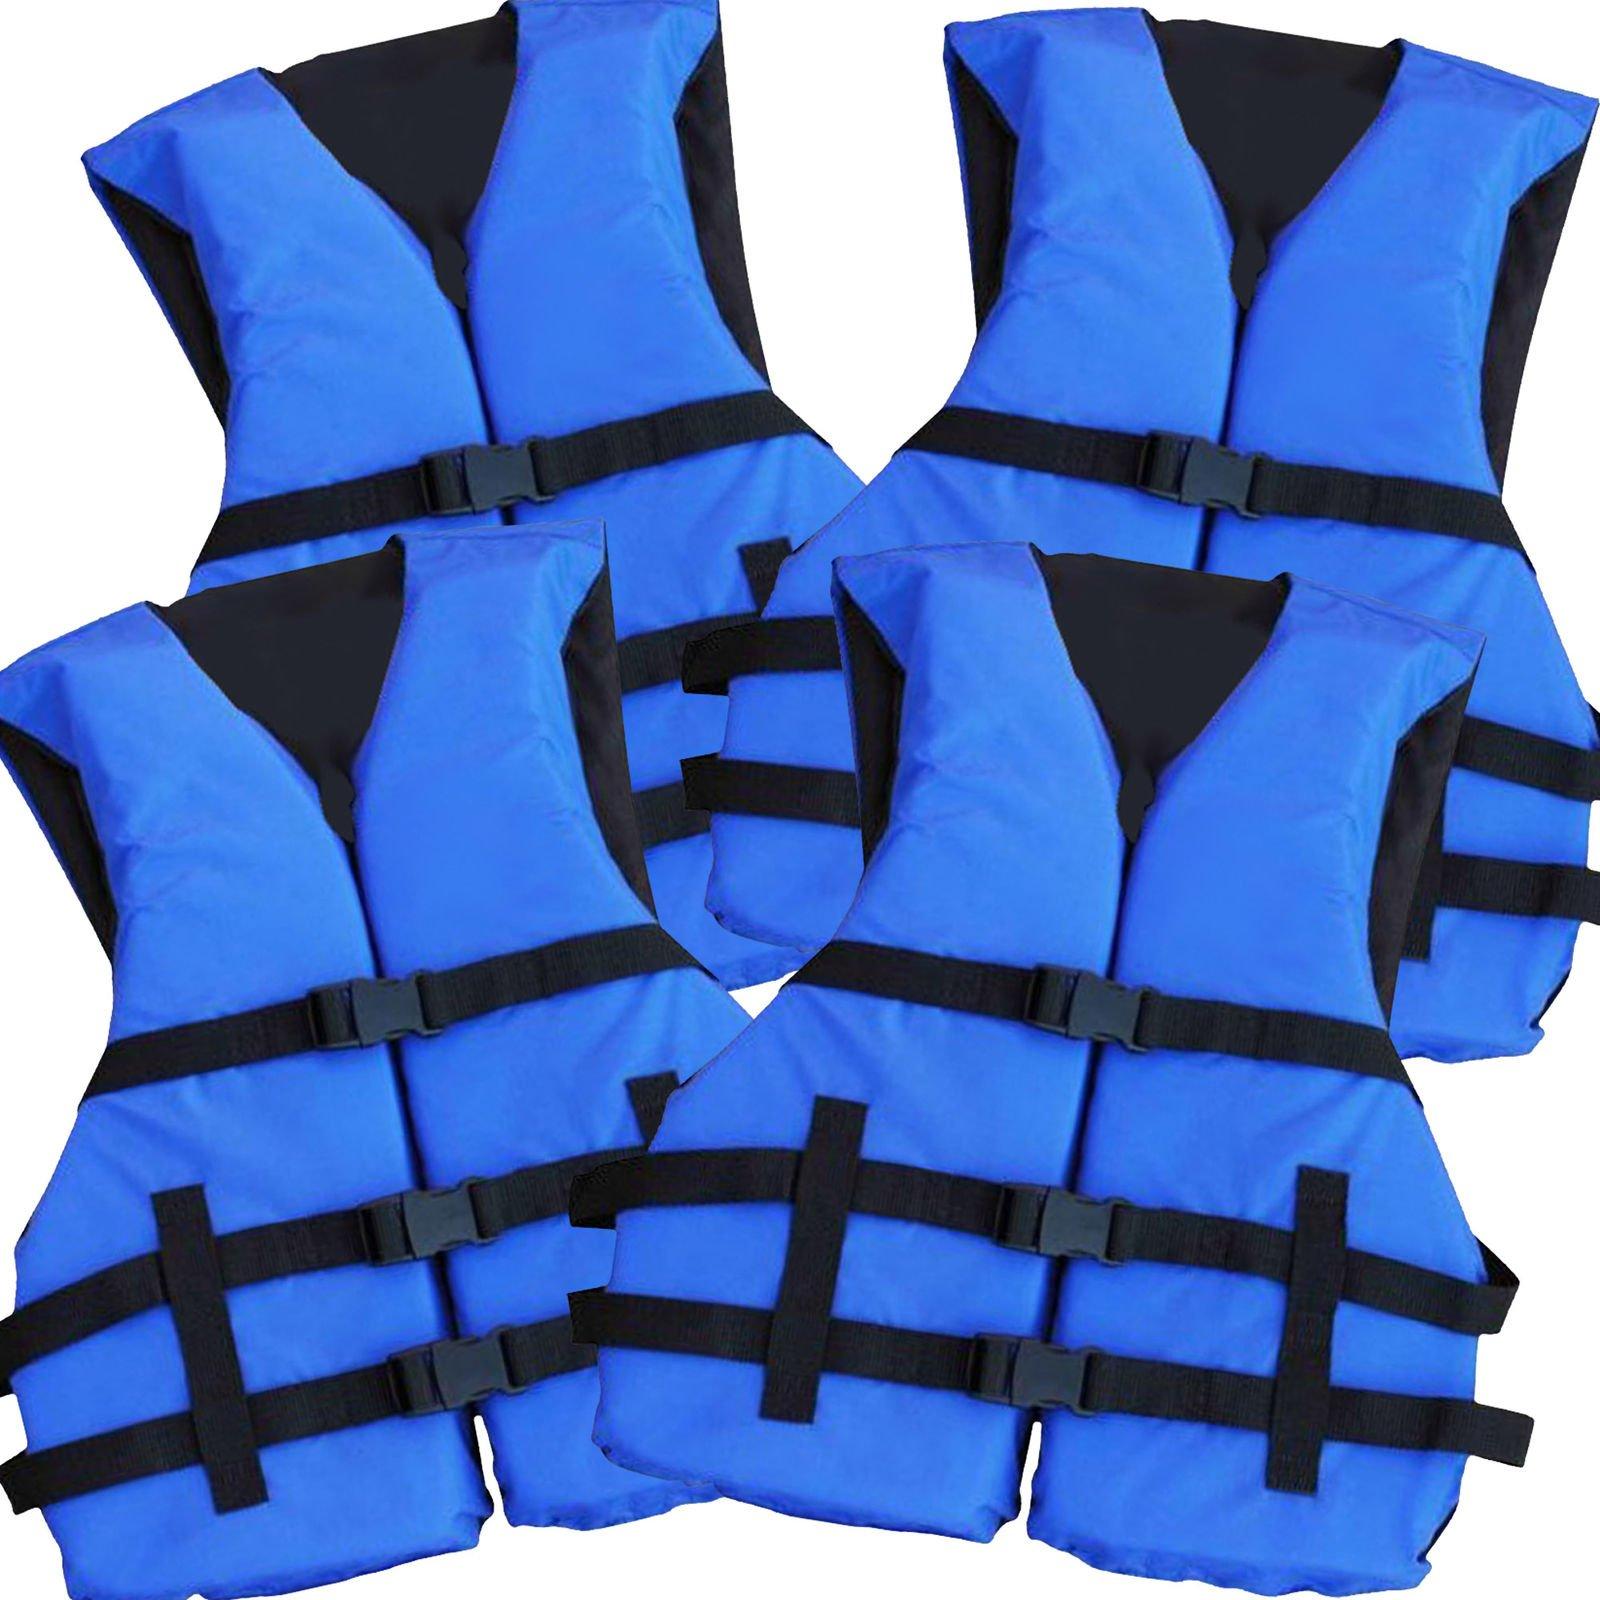 Hardcore Water Sports 4 Pack Coast Guard Approved Life Jacket (Blue) by Hardcore Water Sports